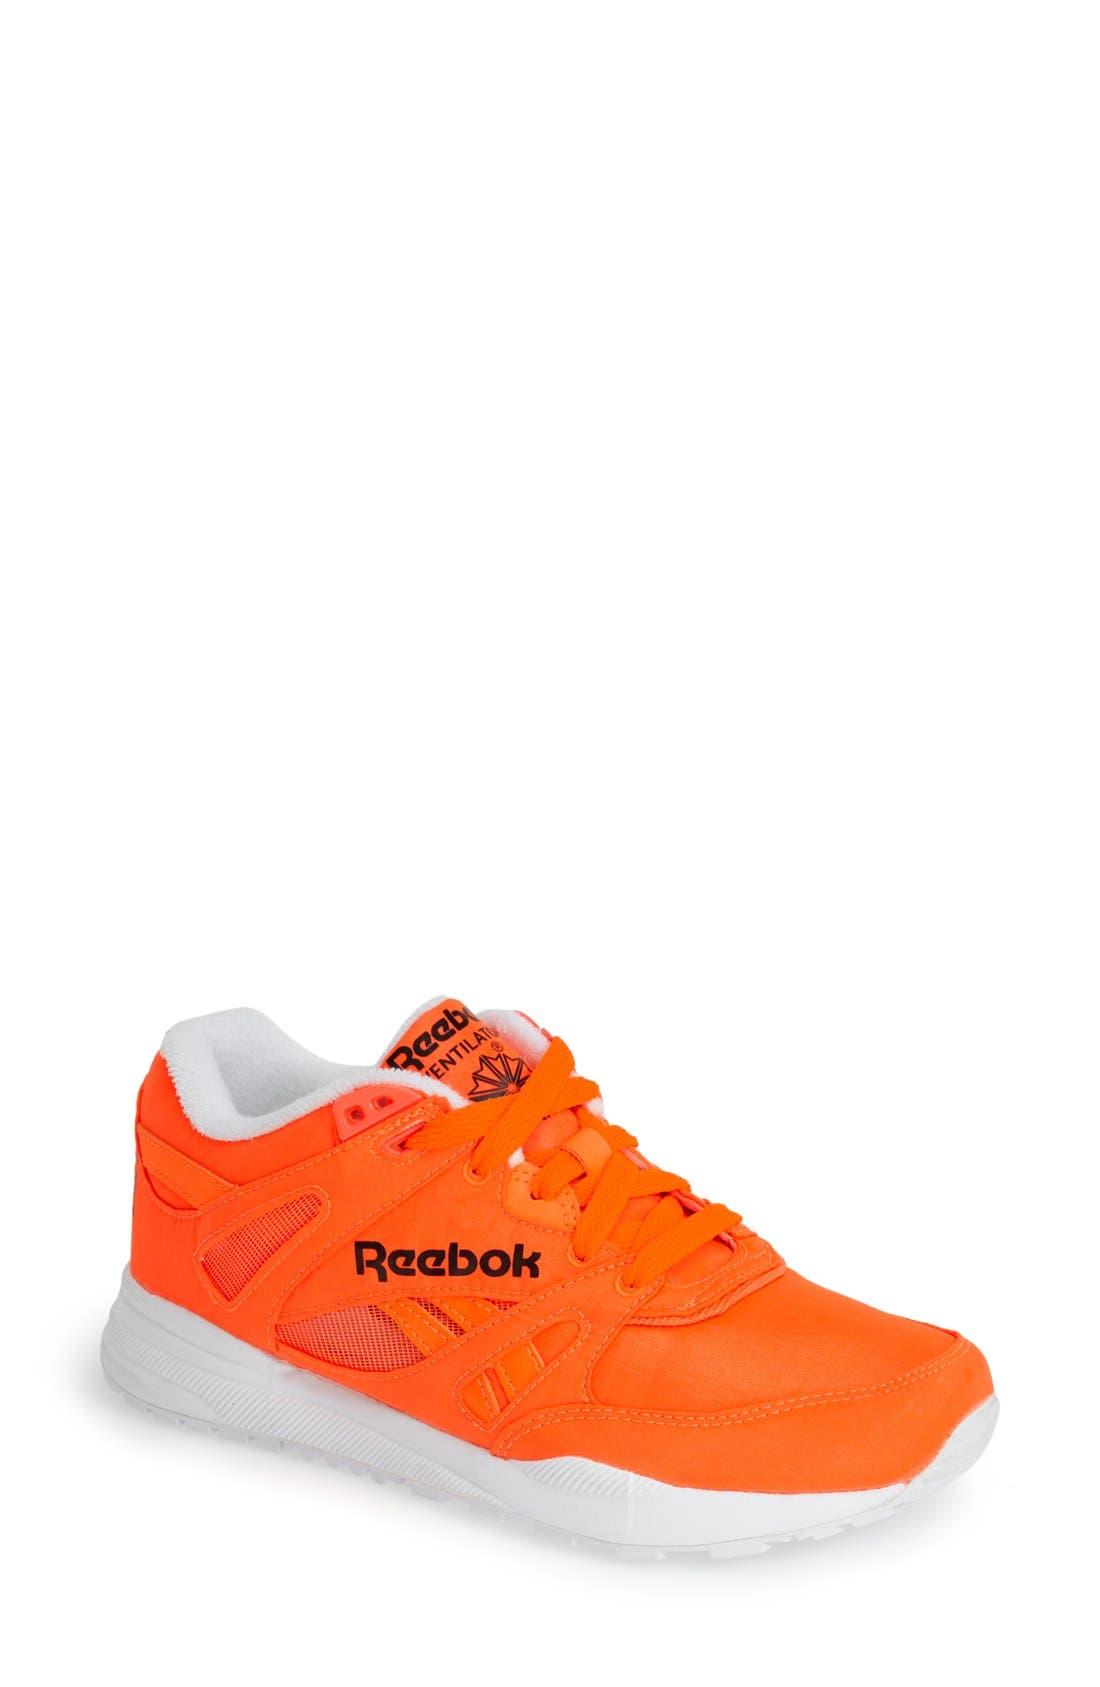 Main Image - Reebok 'Ventilator' Sneaker (Women)